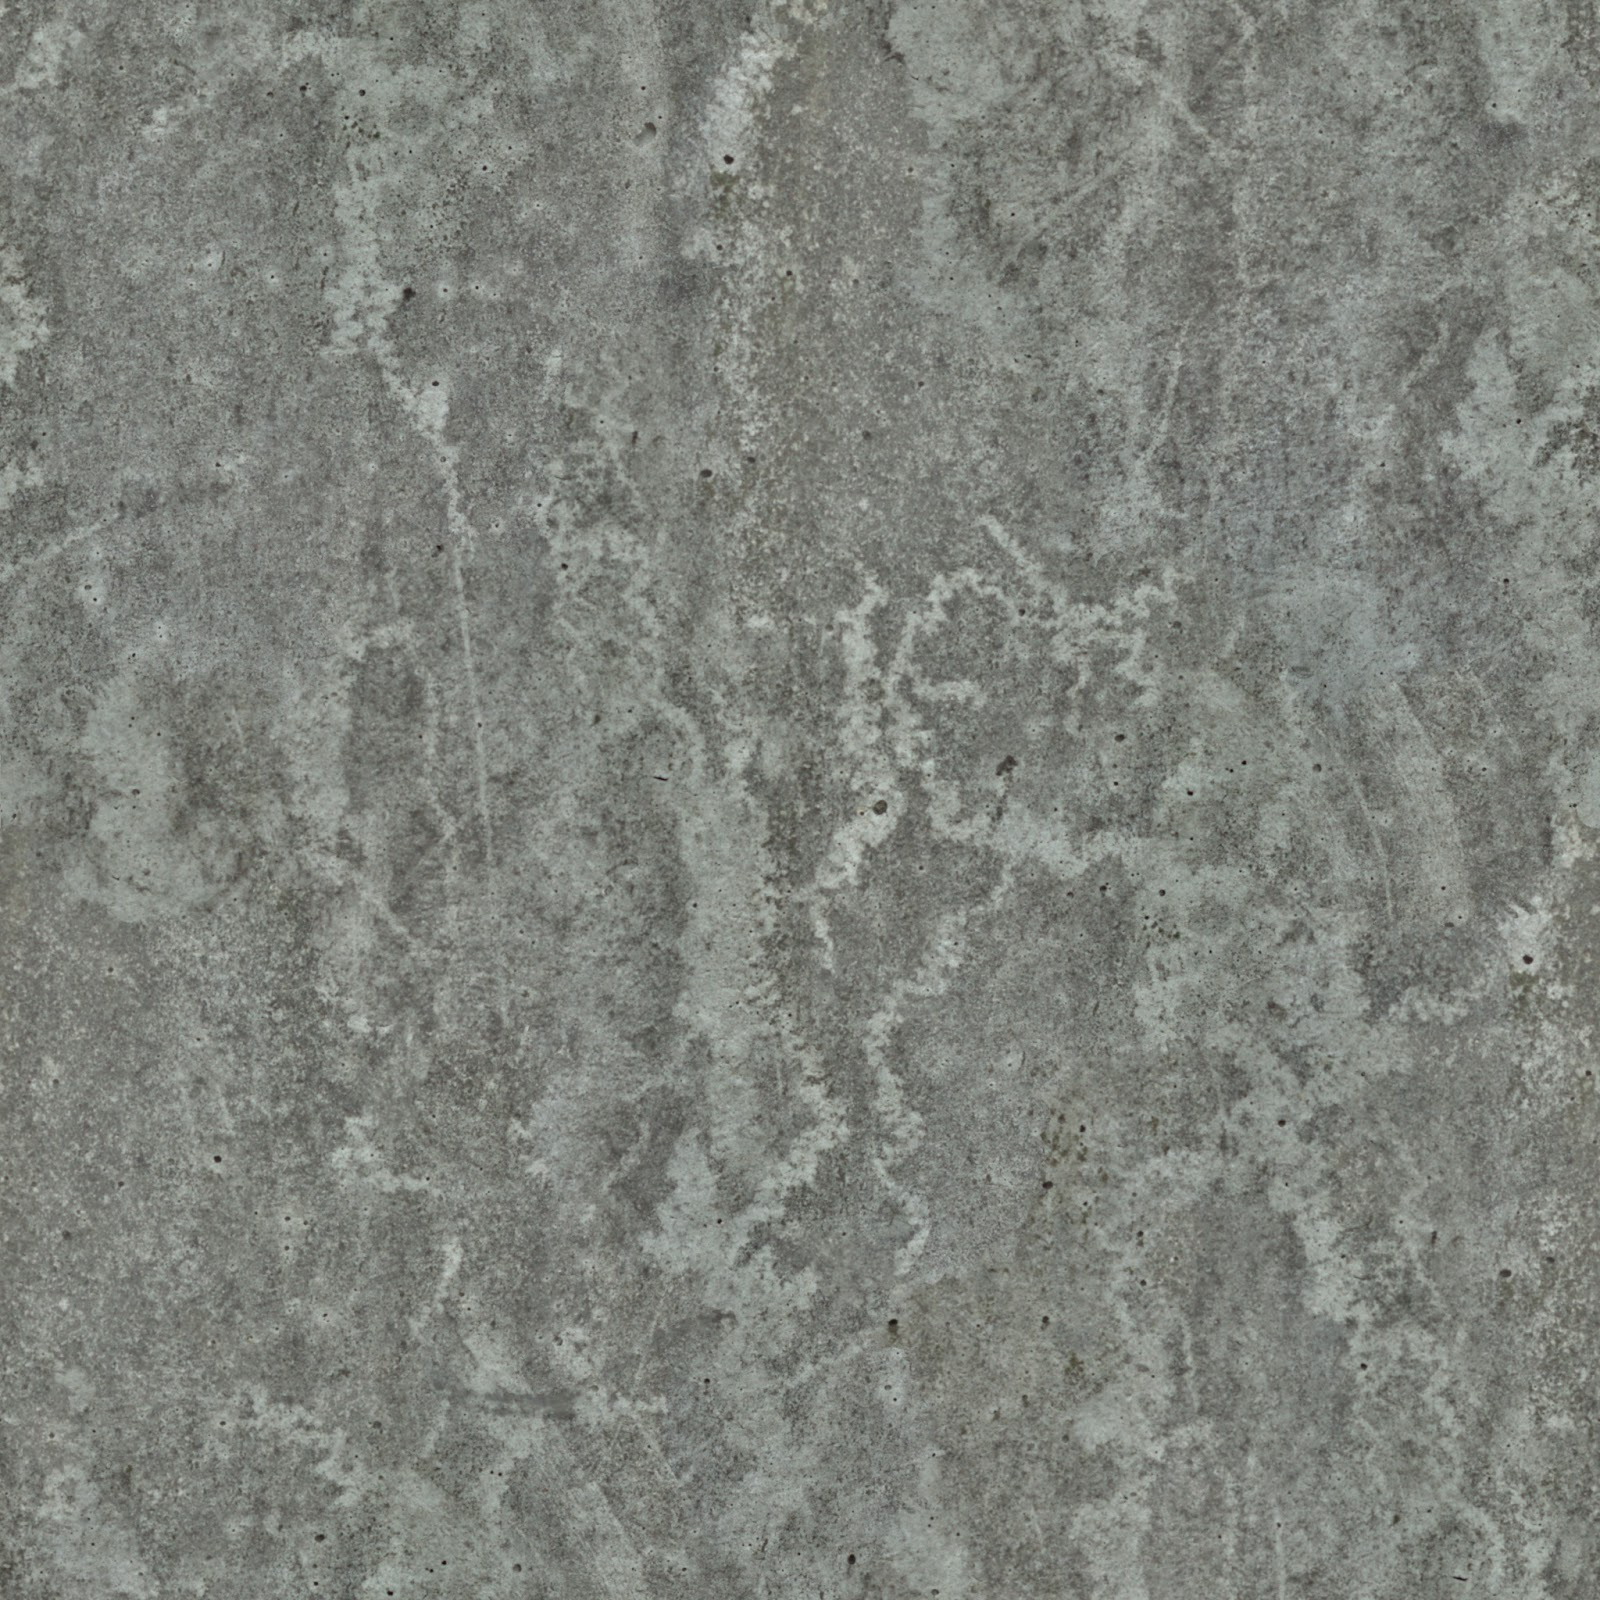 Textured Stone Pillar : High resolution seamless textures concrete wall